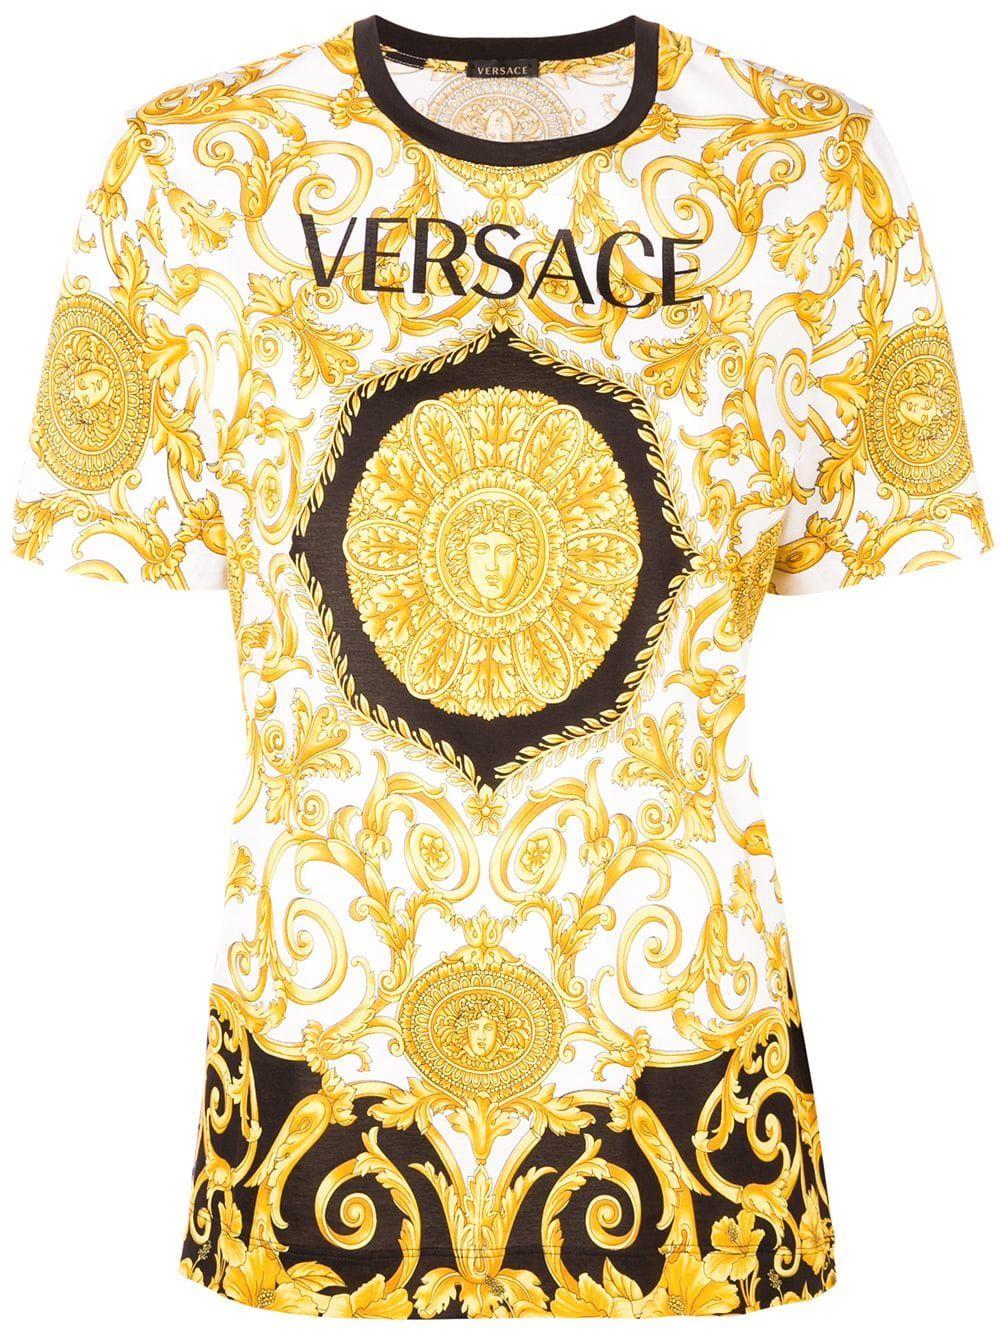 Versace printed T shirt Black | Versace t shirt, Versace